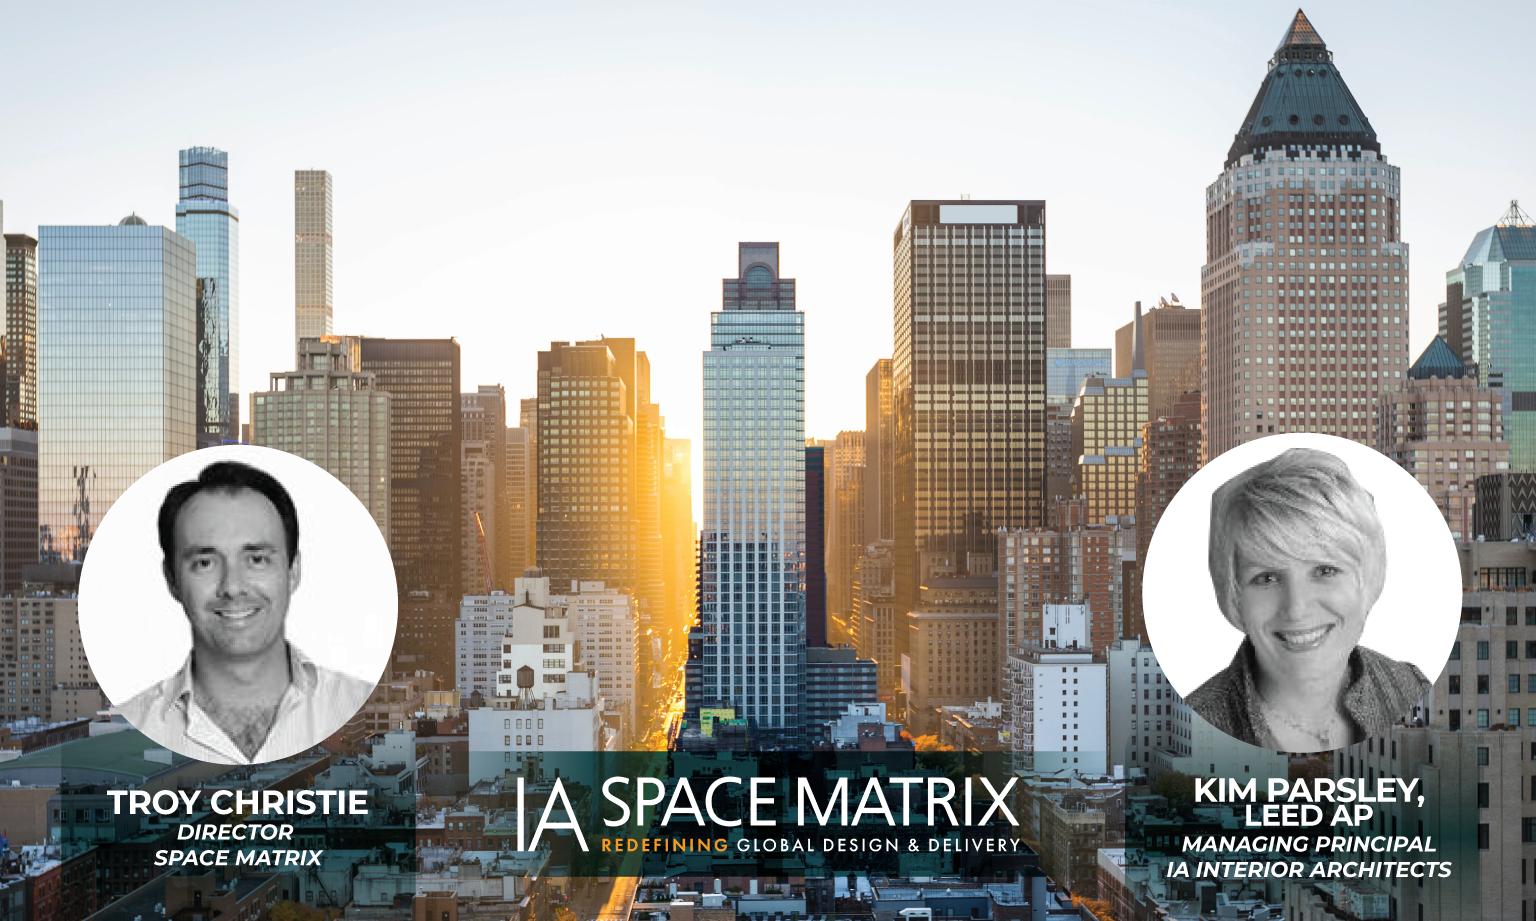 Troy Christie and Kim Parsley lead the IA Space Matrix Global Studio